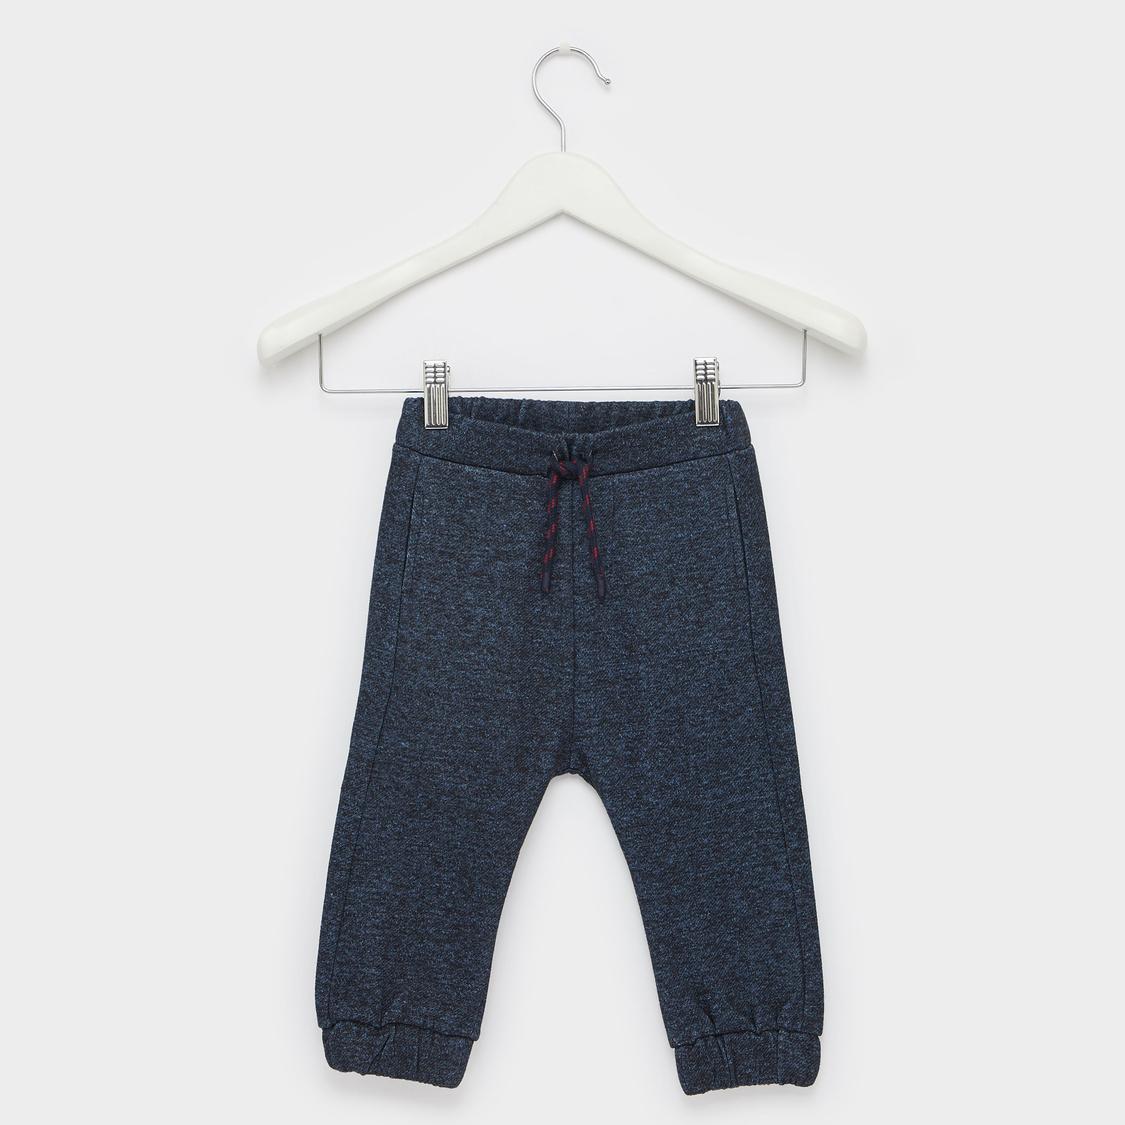 Textured Jog Pants with Bear Applique and Drawstring Closure